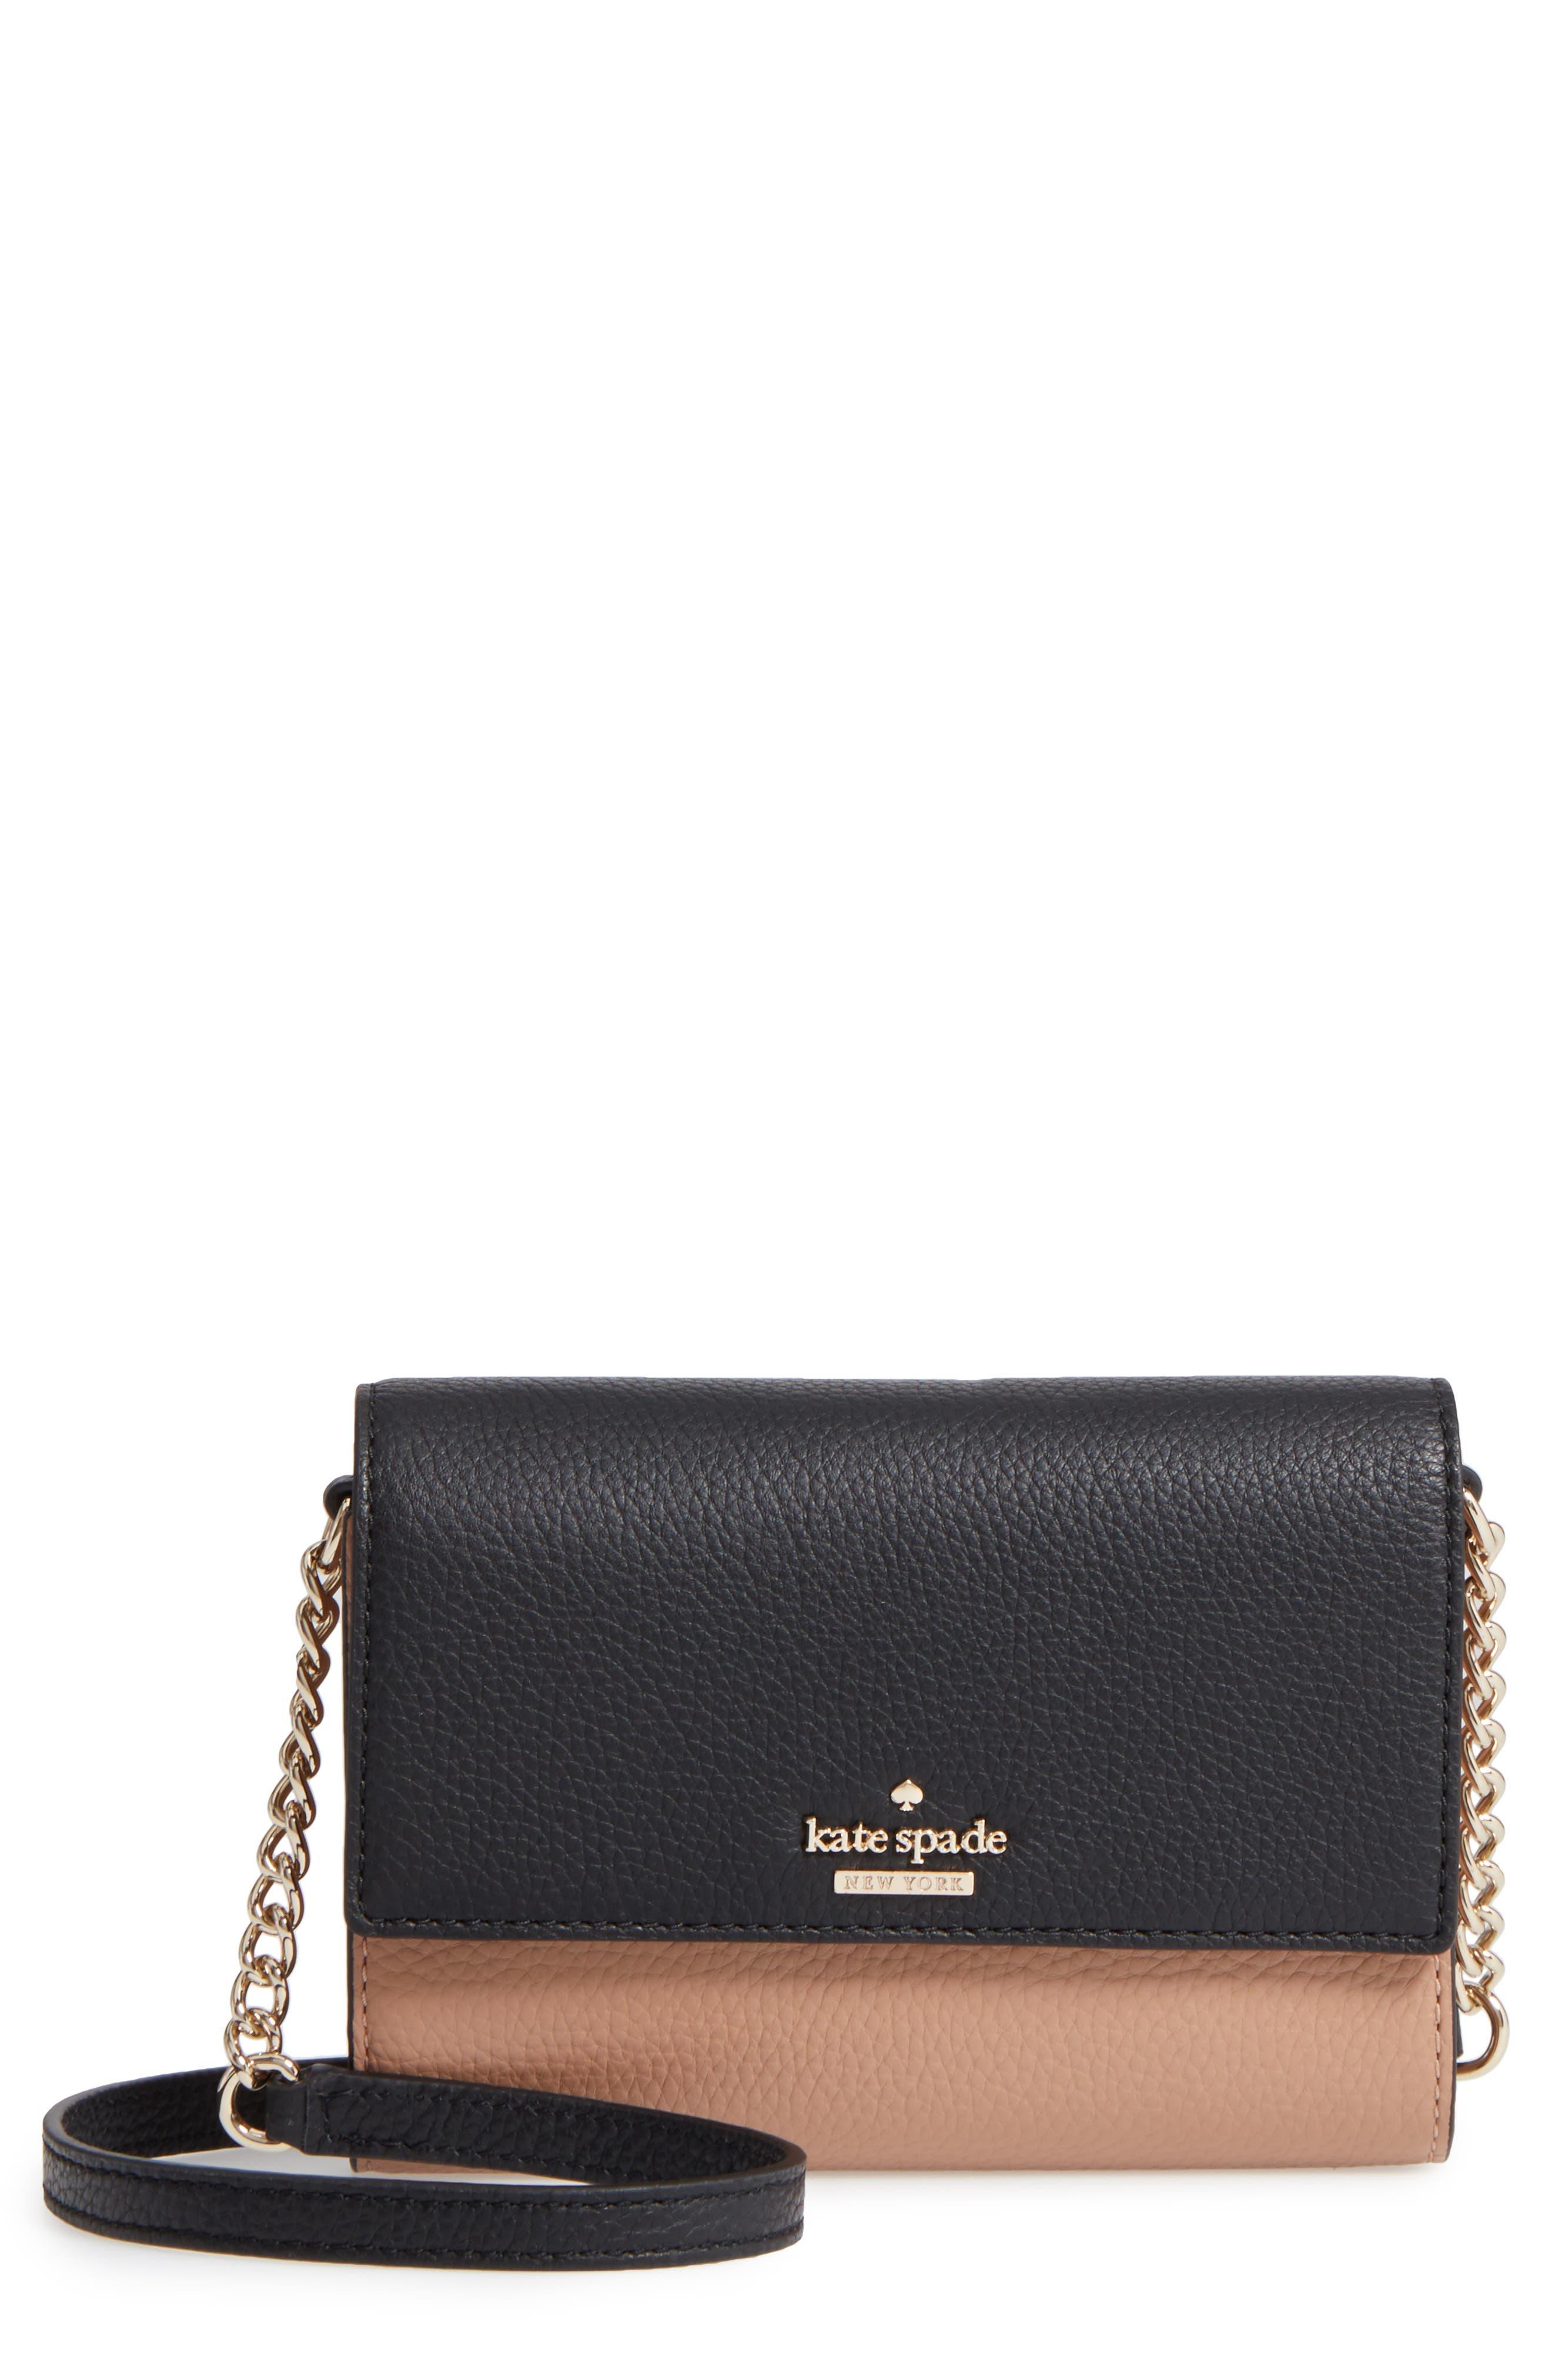 kate spade new york jackson street - iva leather crossbody bag